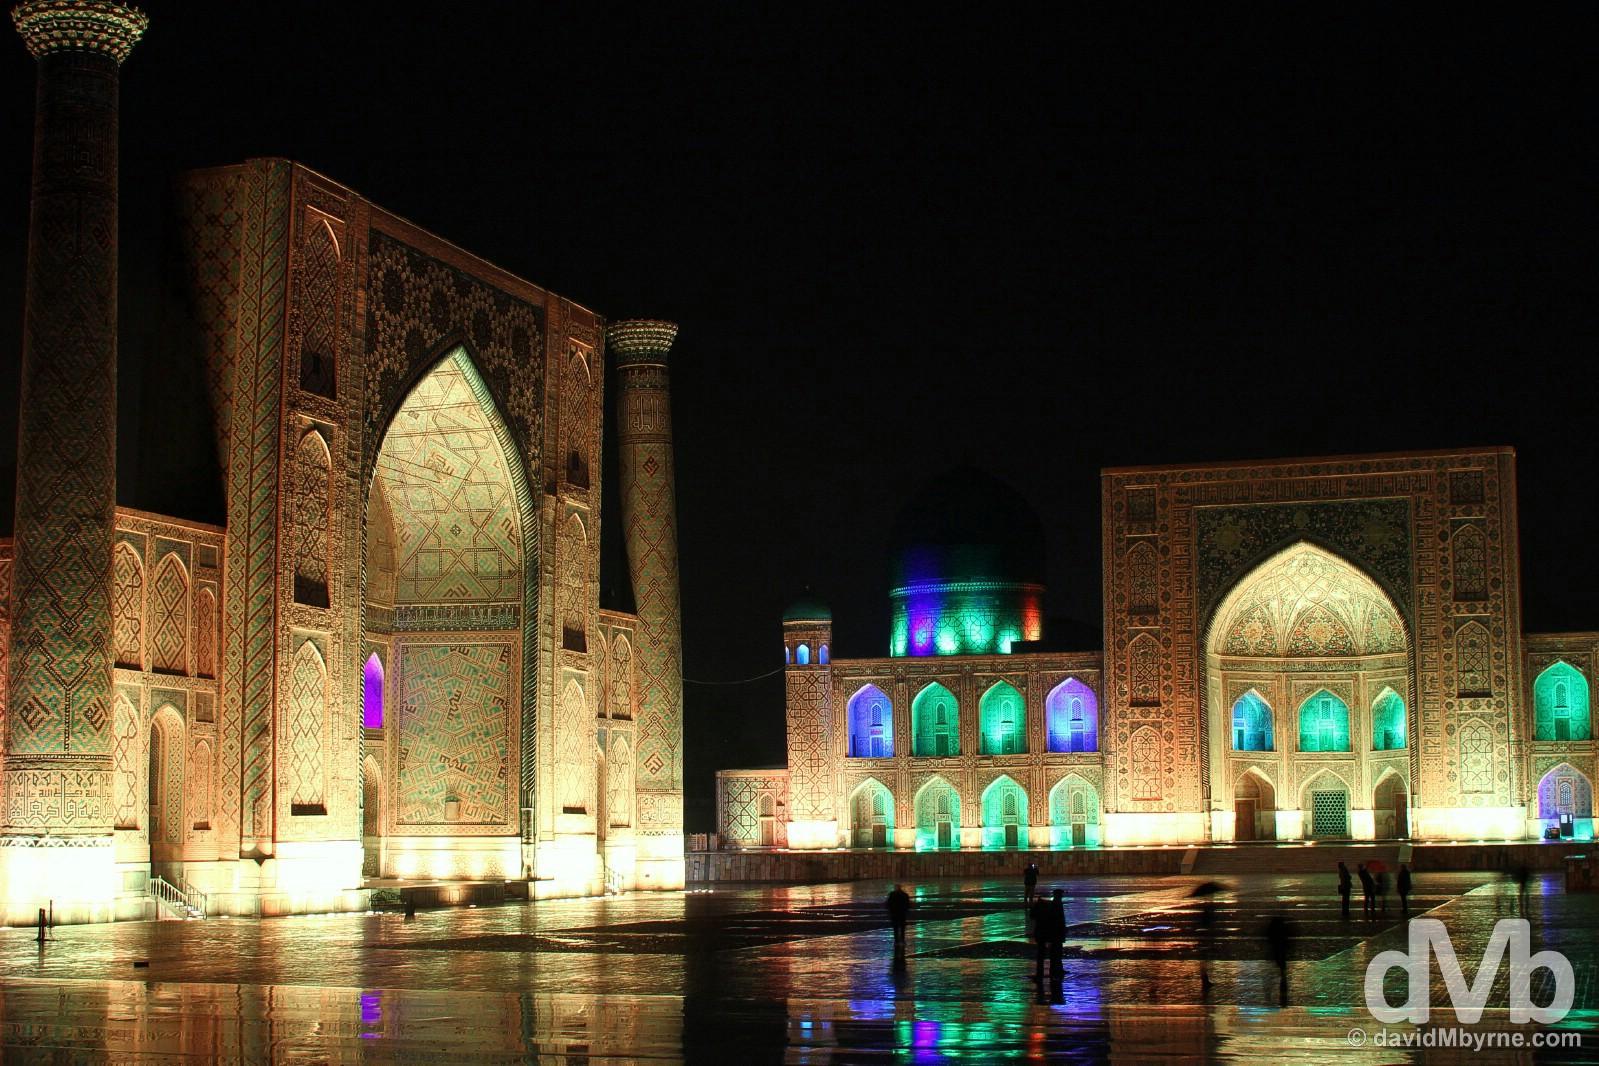 Sound & Light Show at the The Registan in Samarkand, Uzbekistan. March 7, 2015.